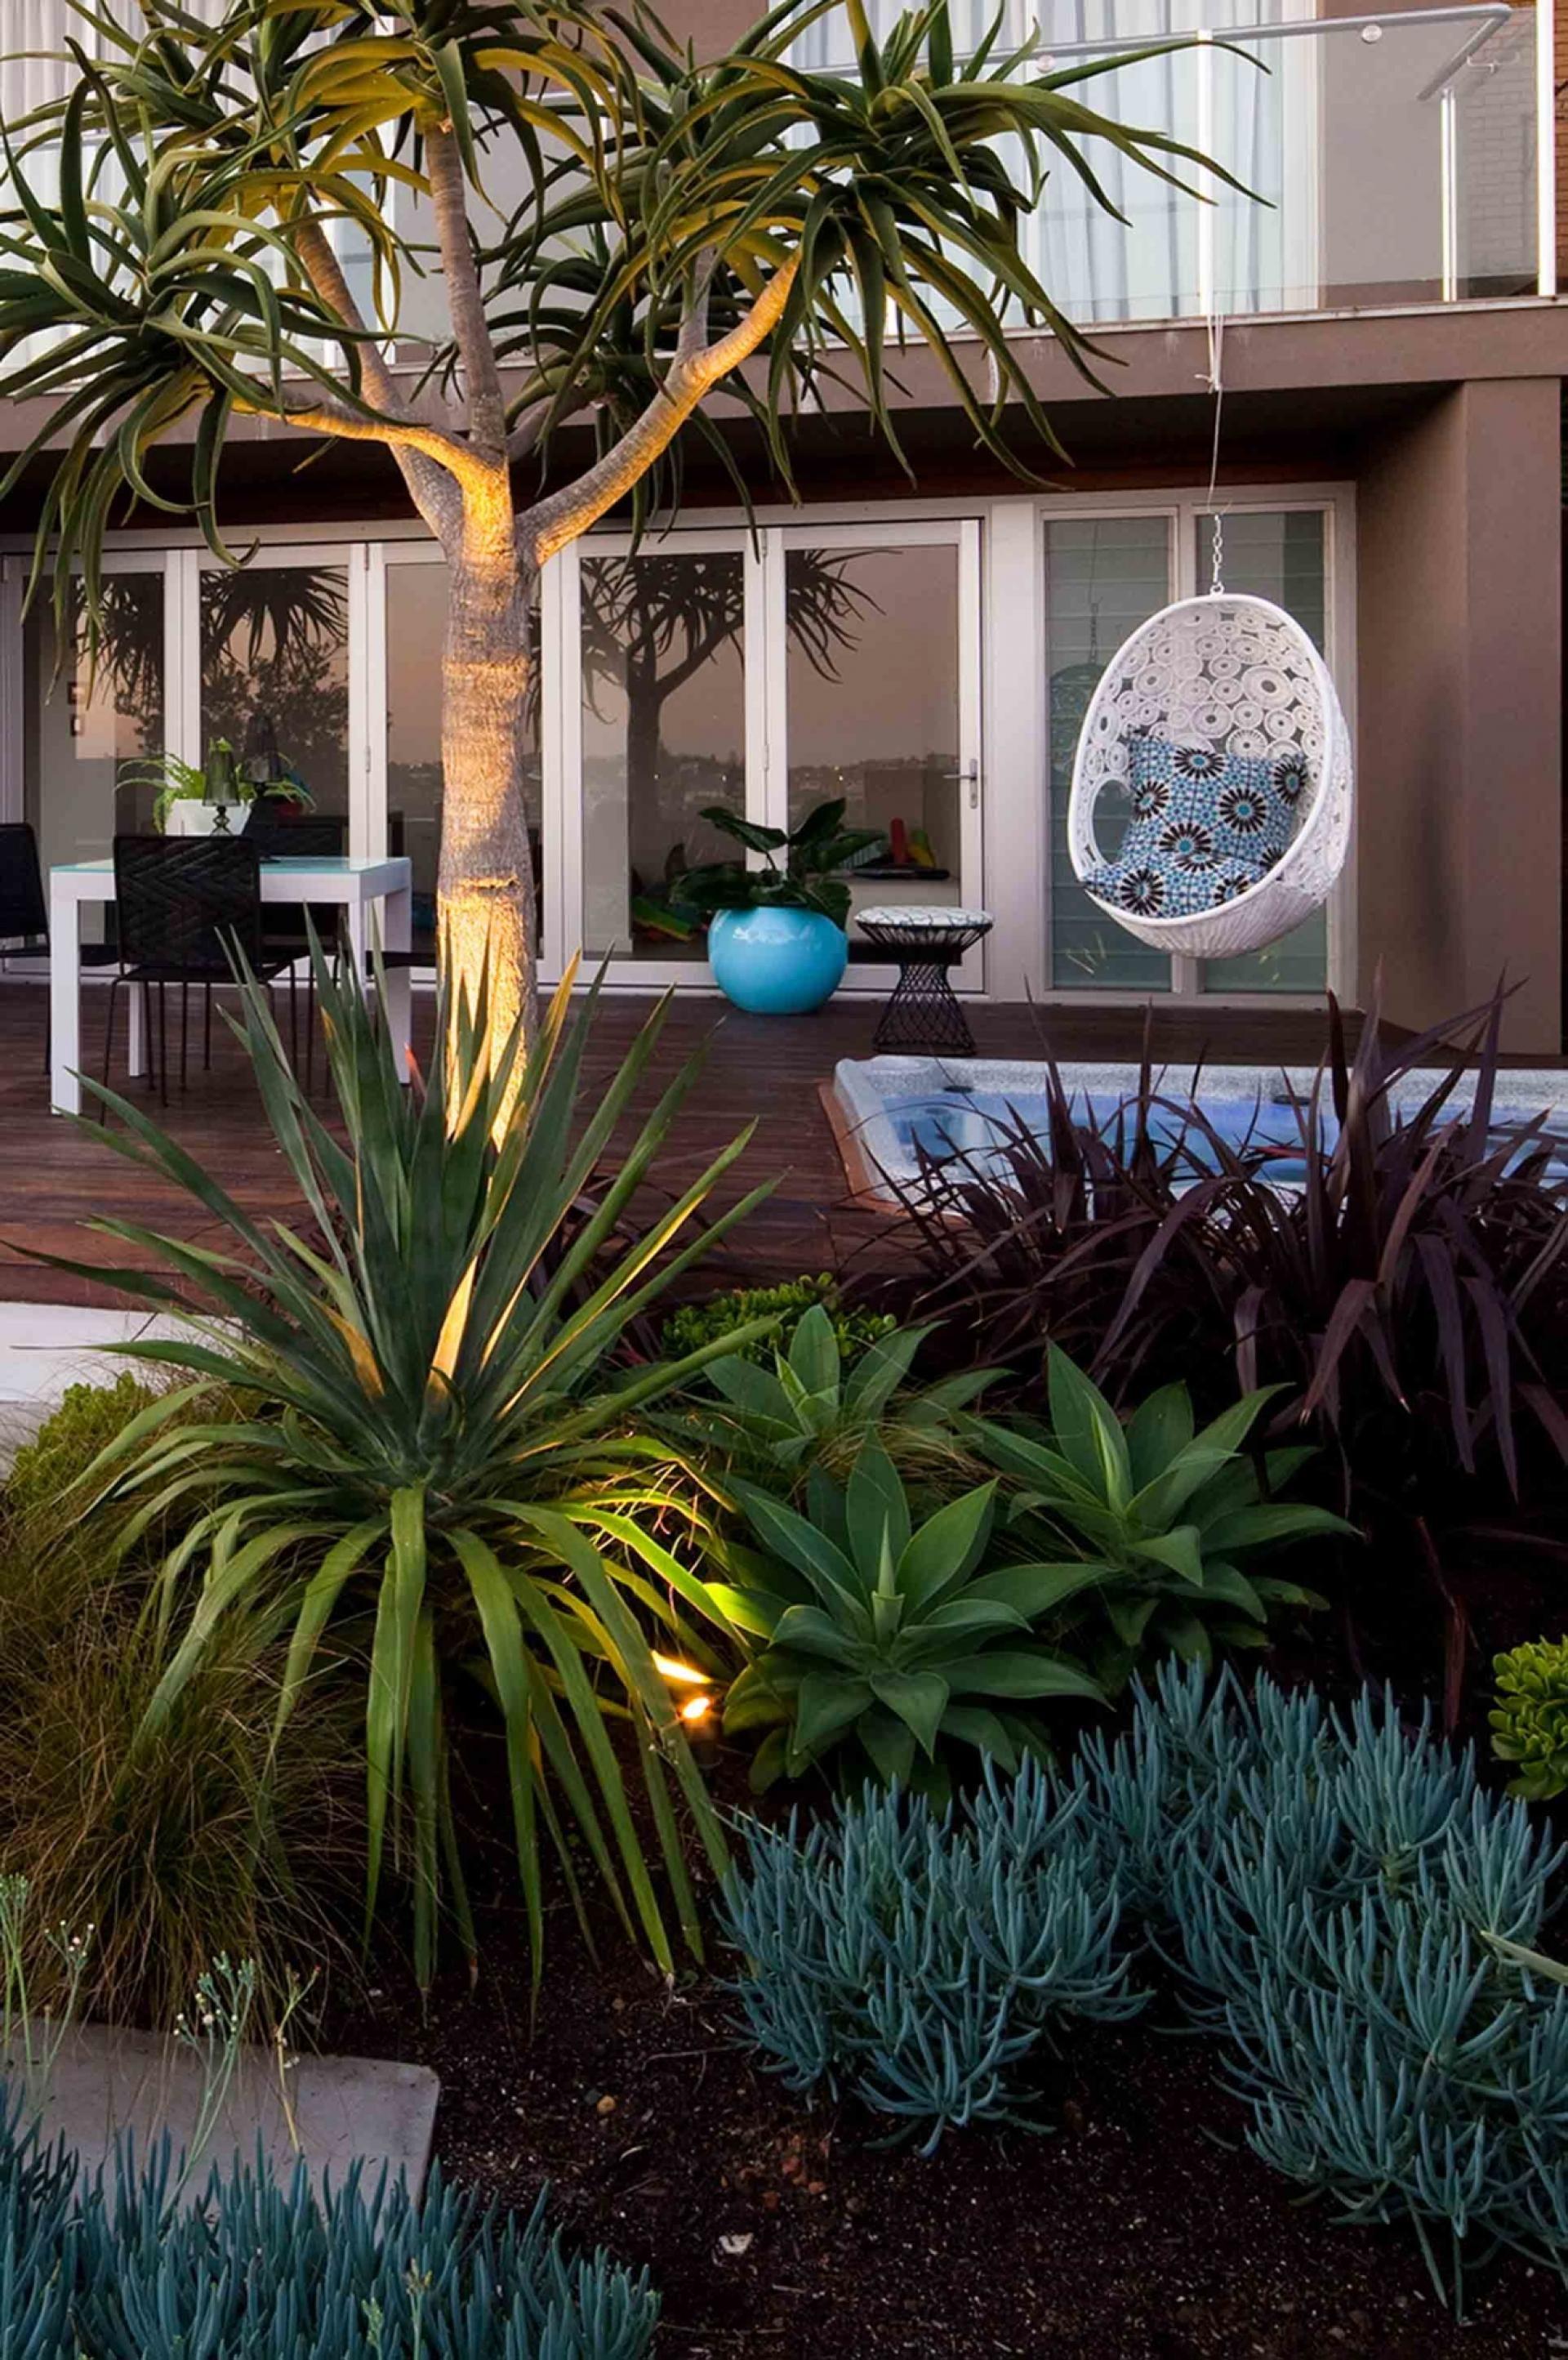 Genial Beachside Garden: Ideas For Luxe Outdoor Living. Photography By Jason Busch.